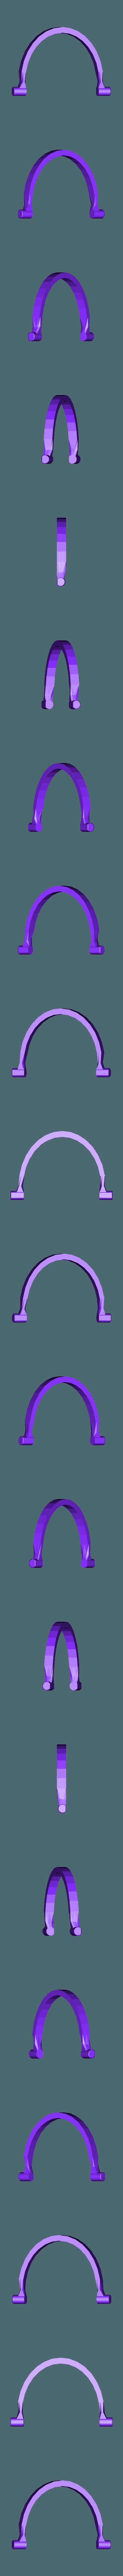 3d-fabric-jean-pierre-bird-feeder-to-hang-handle.stl Download STL file bird feeder to hang • 3D printable template, 3d-fabric-jean-pierre